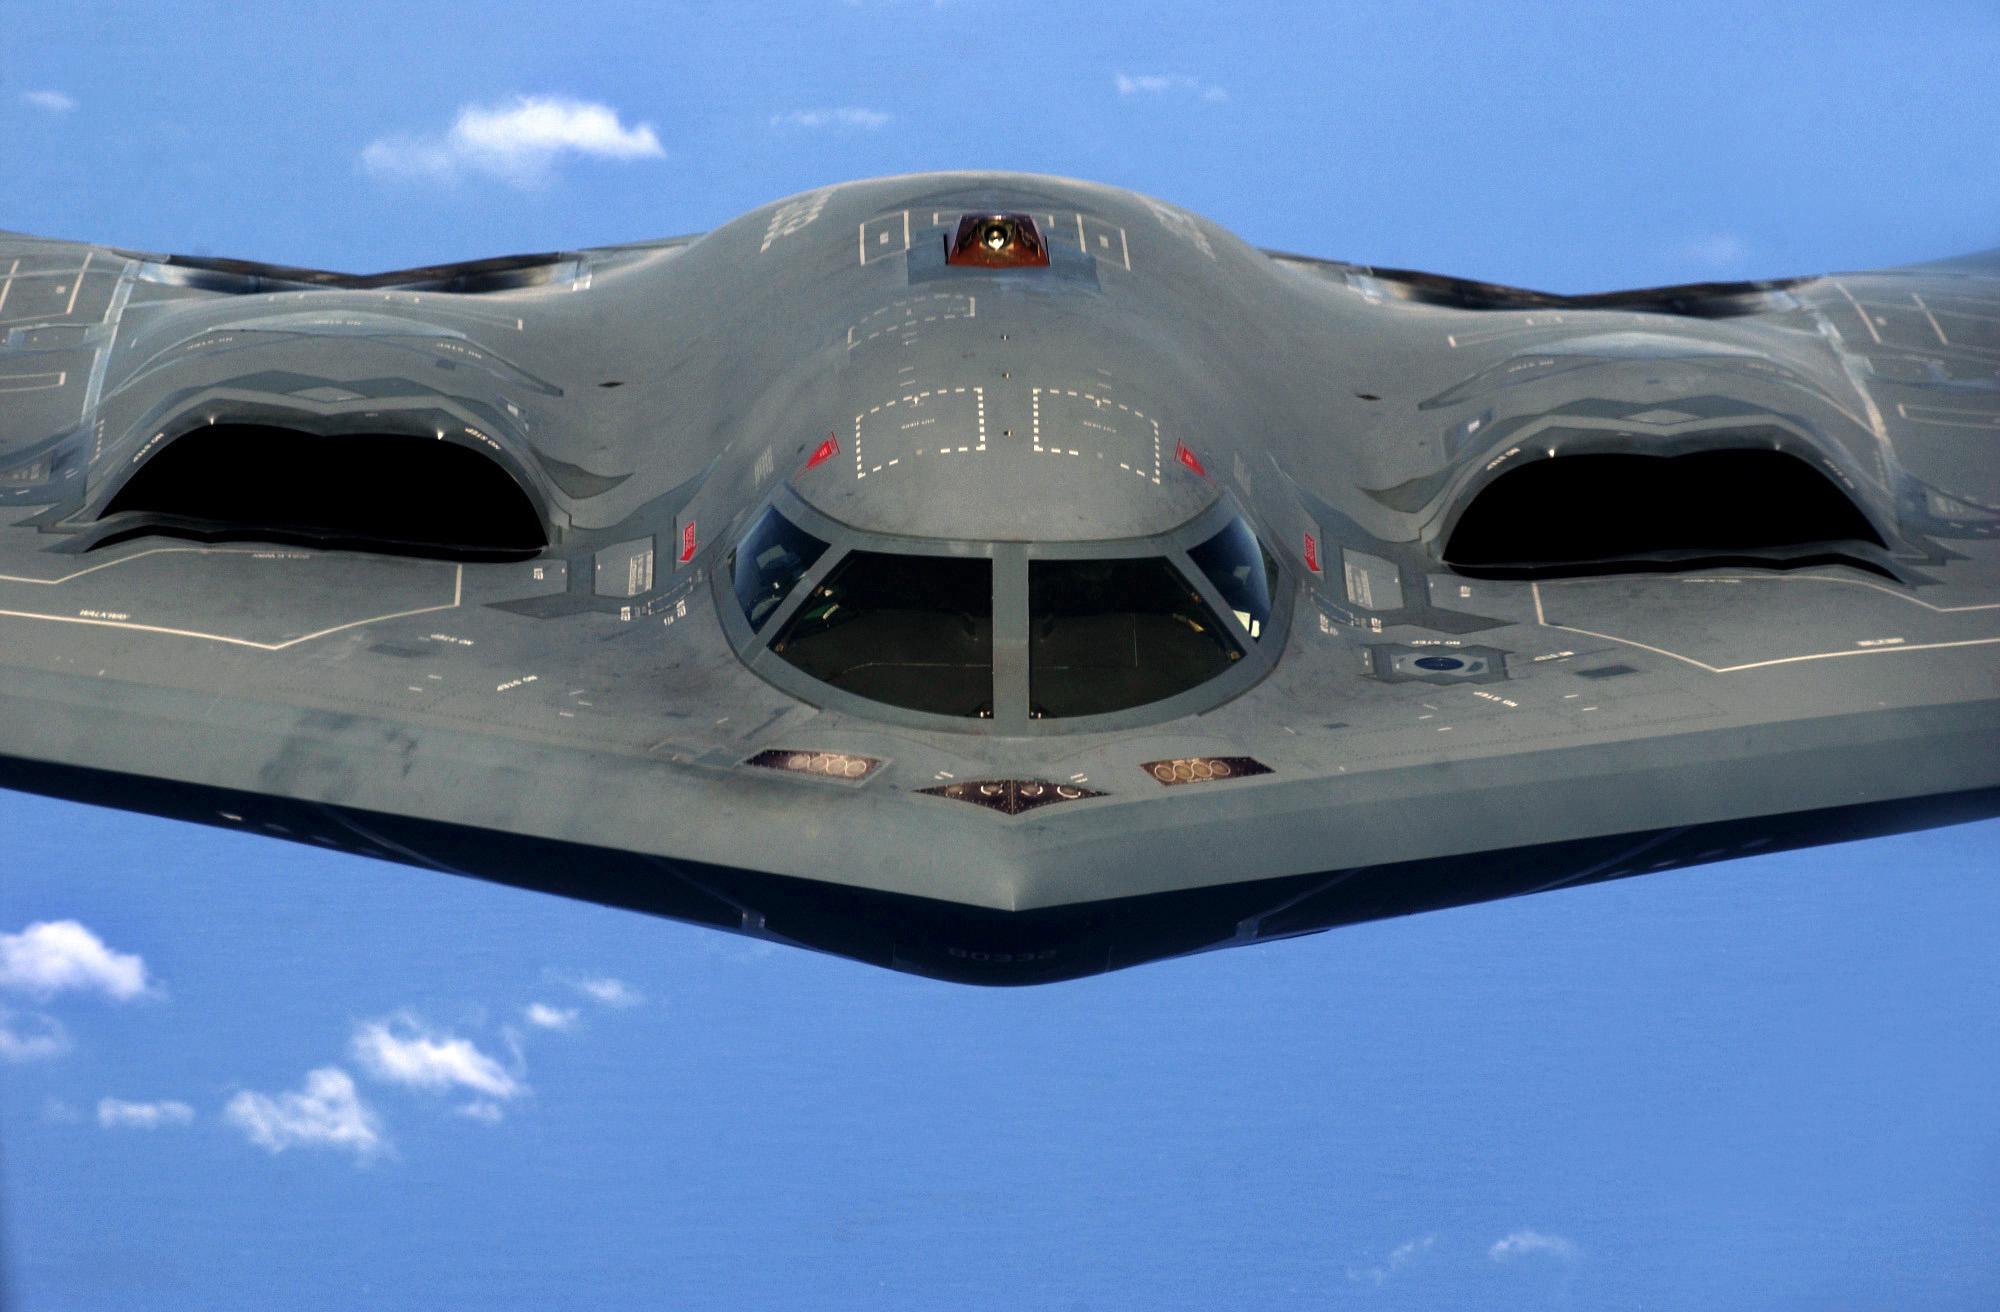 Amerika serikat mengembangkan pesawat ini sejak 1978 melalui program